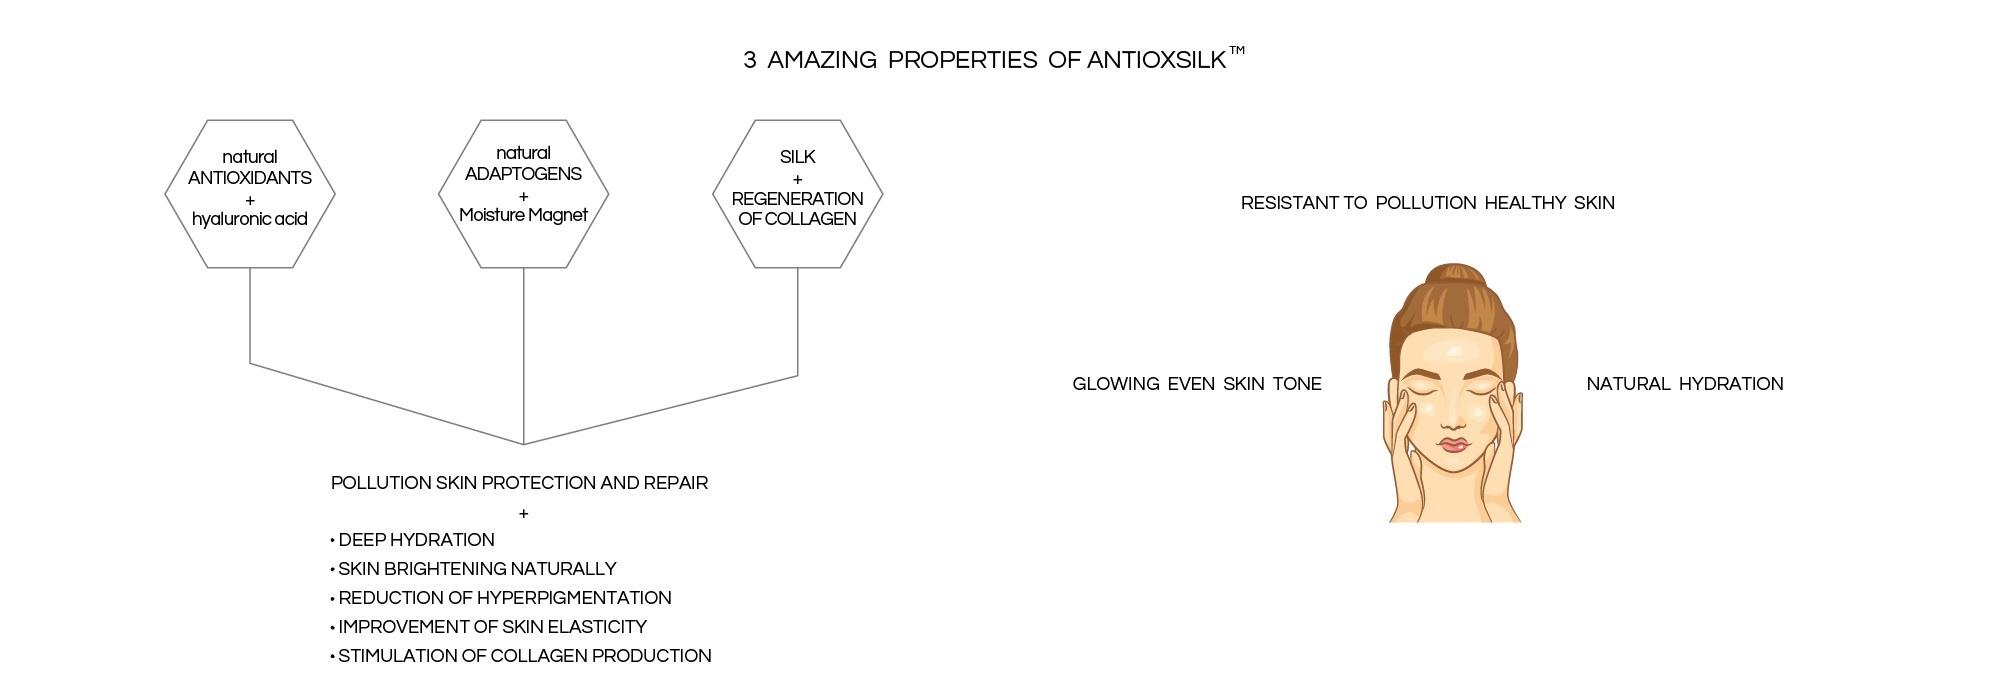 antioxsilk explained